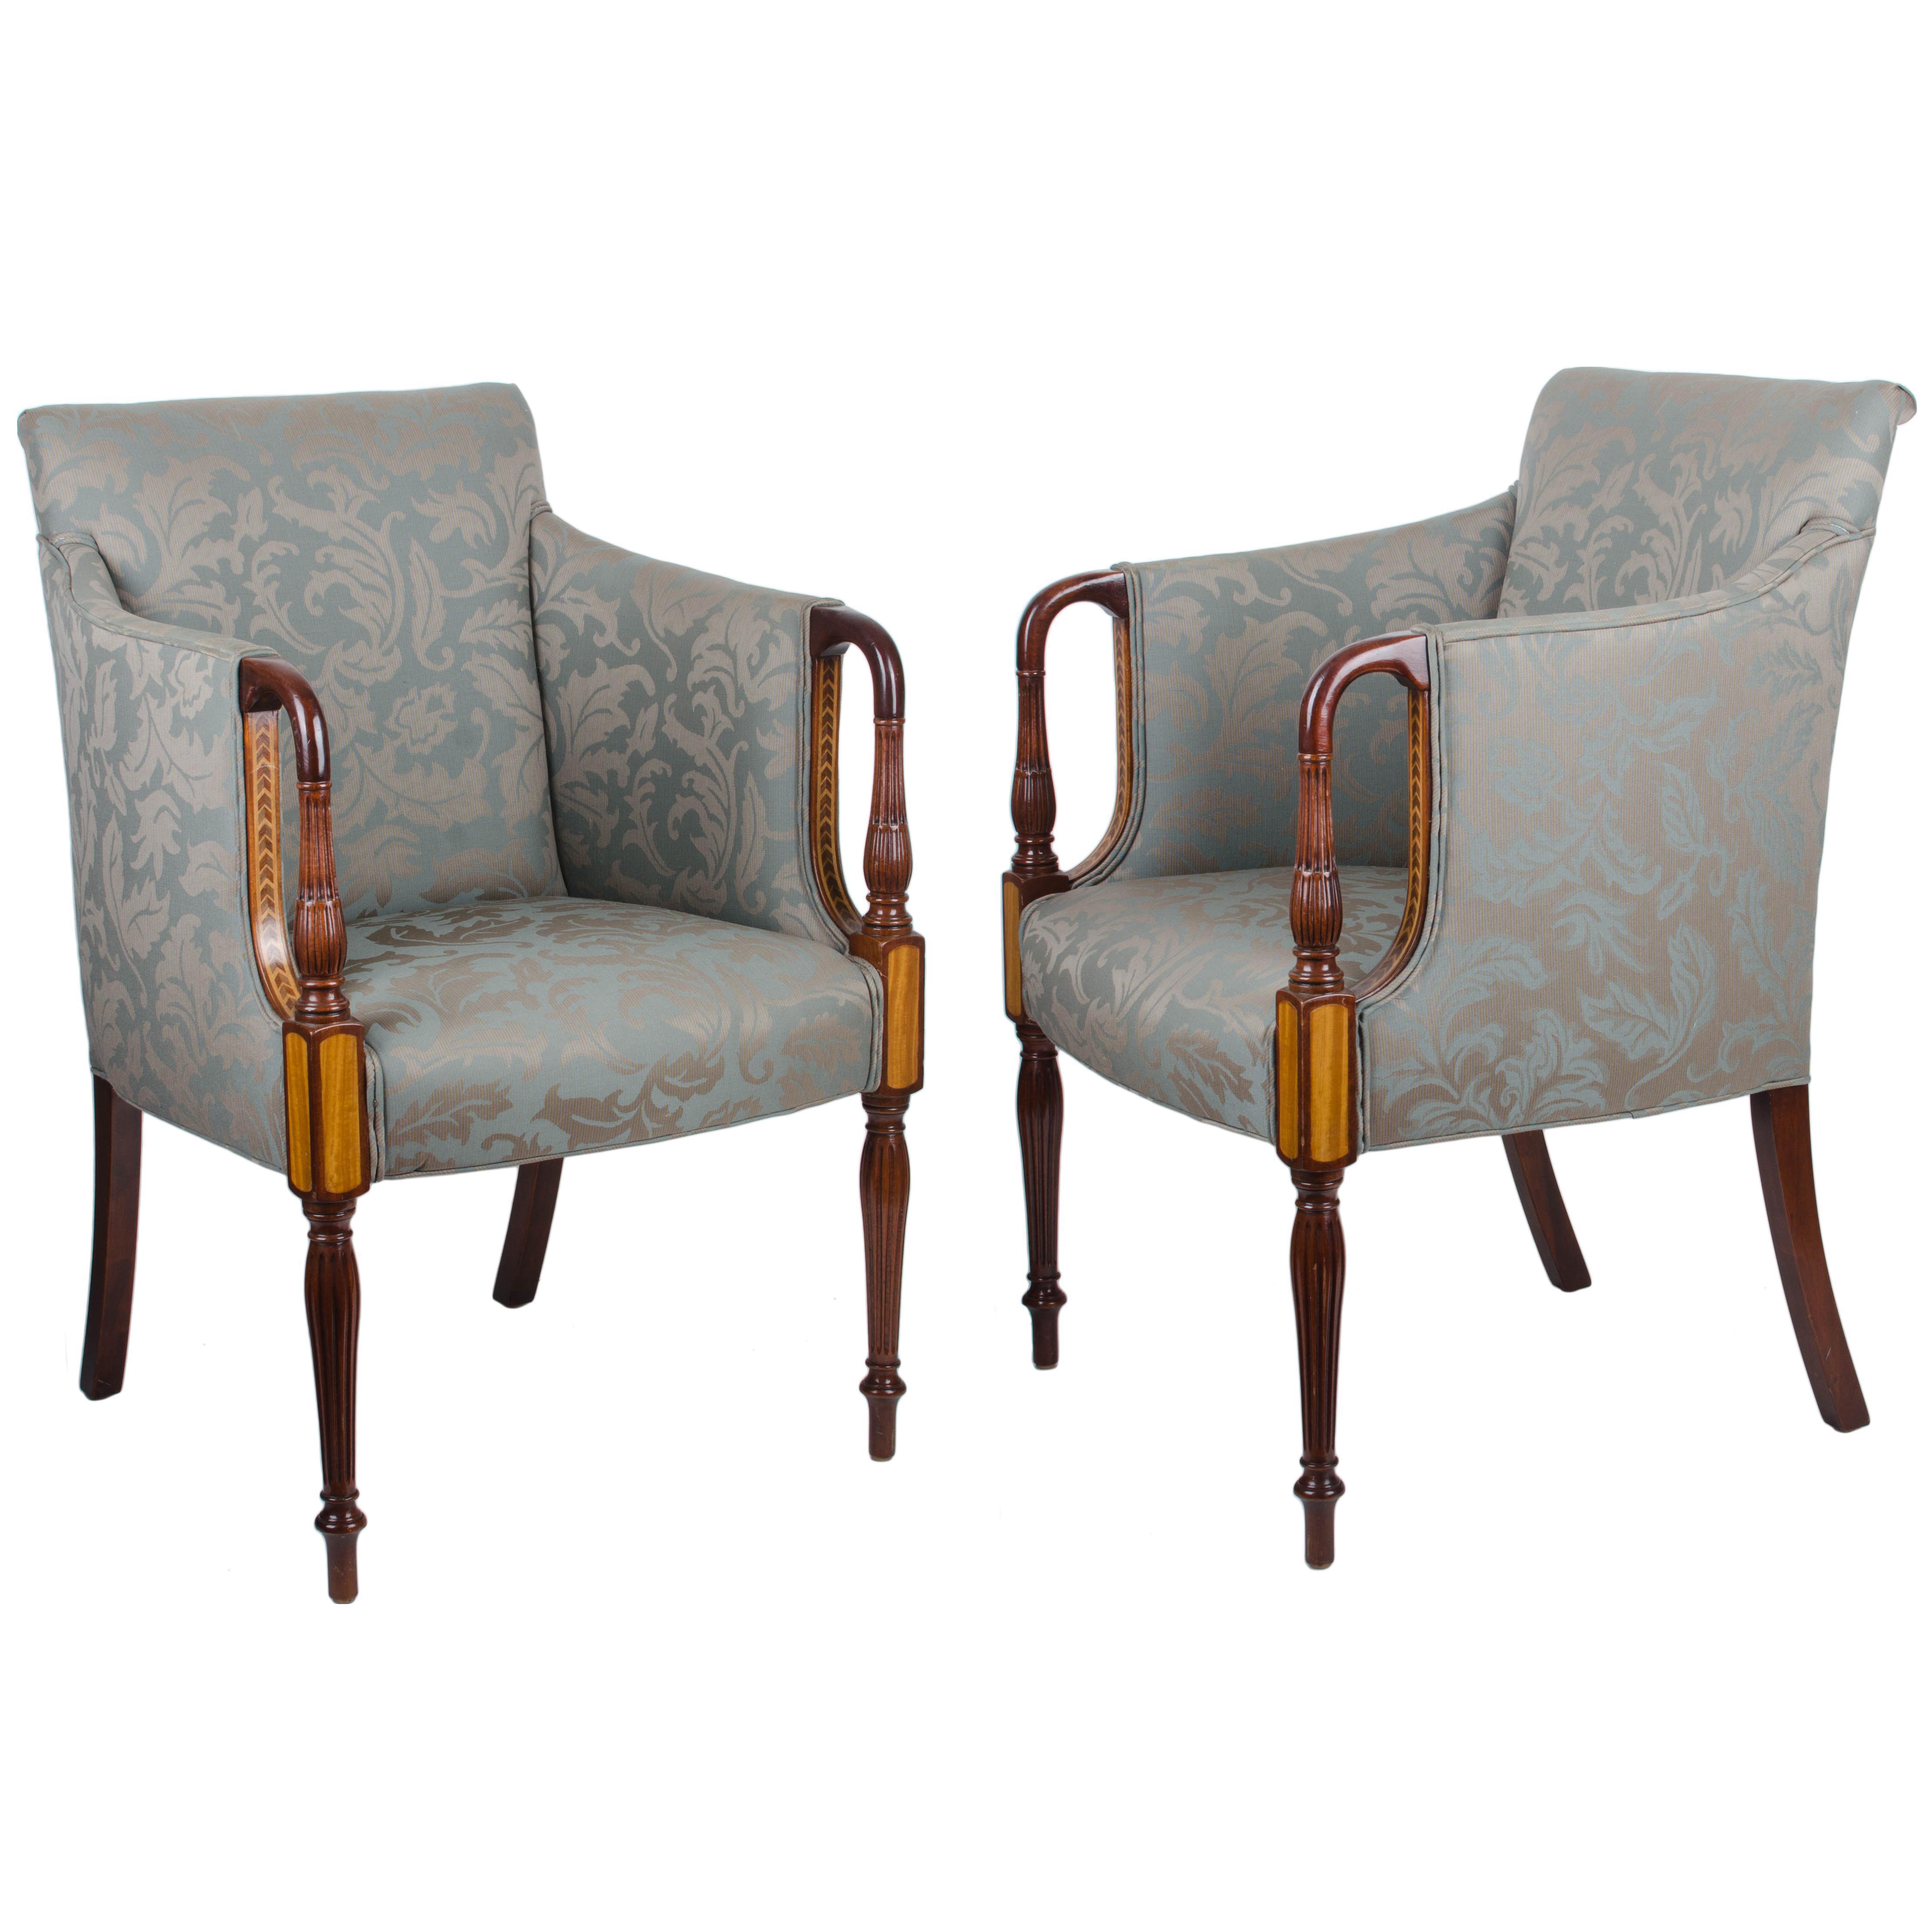 Ordinaire Southwood Sheraton Style Inlaid Mahogany Club Chairs   A Pair